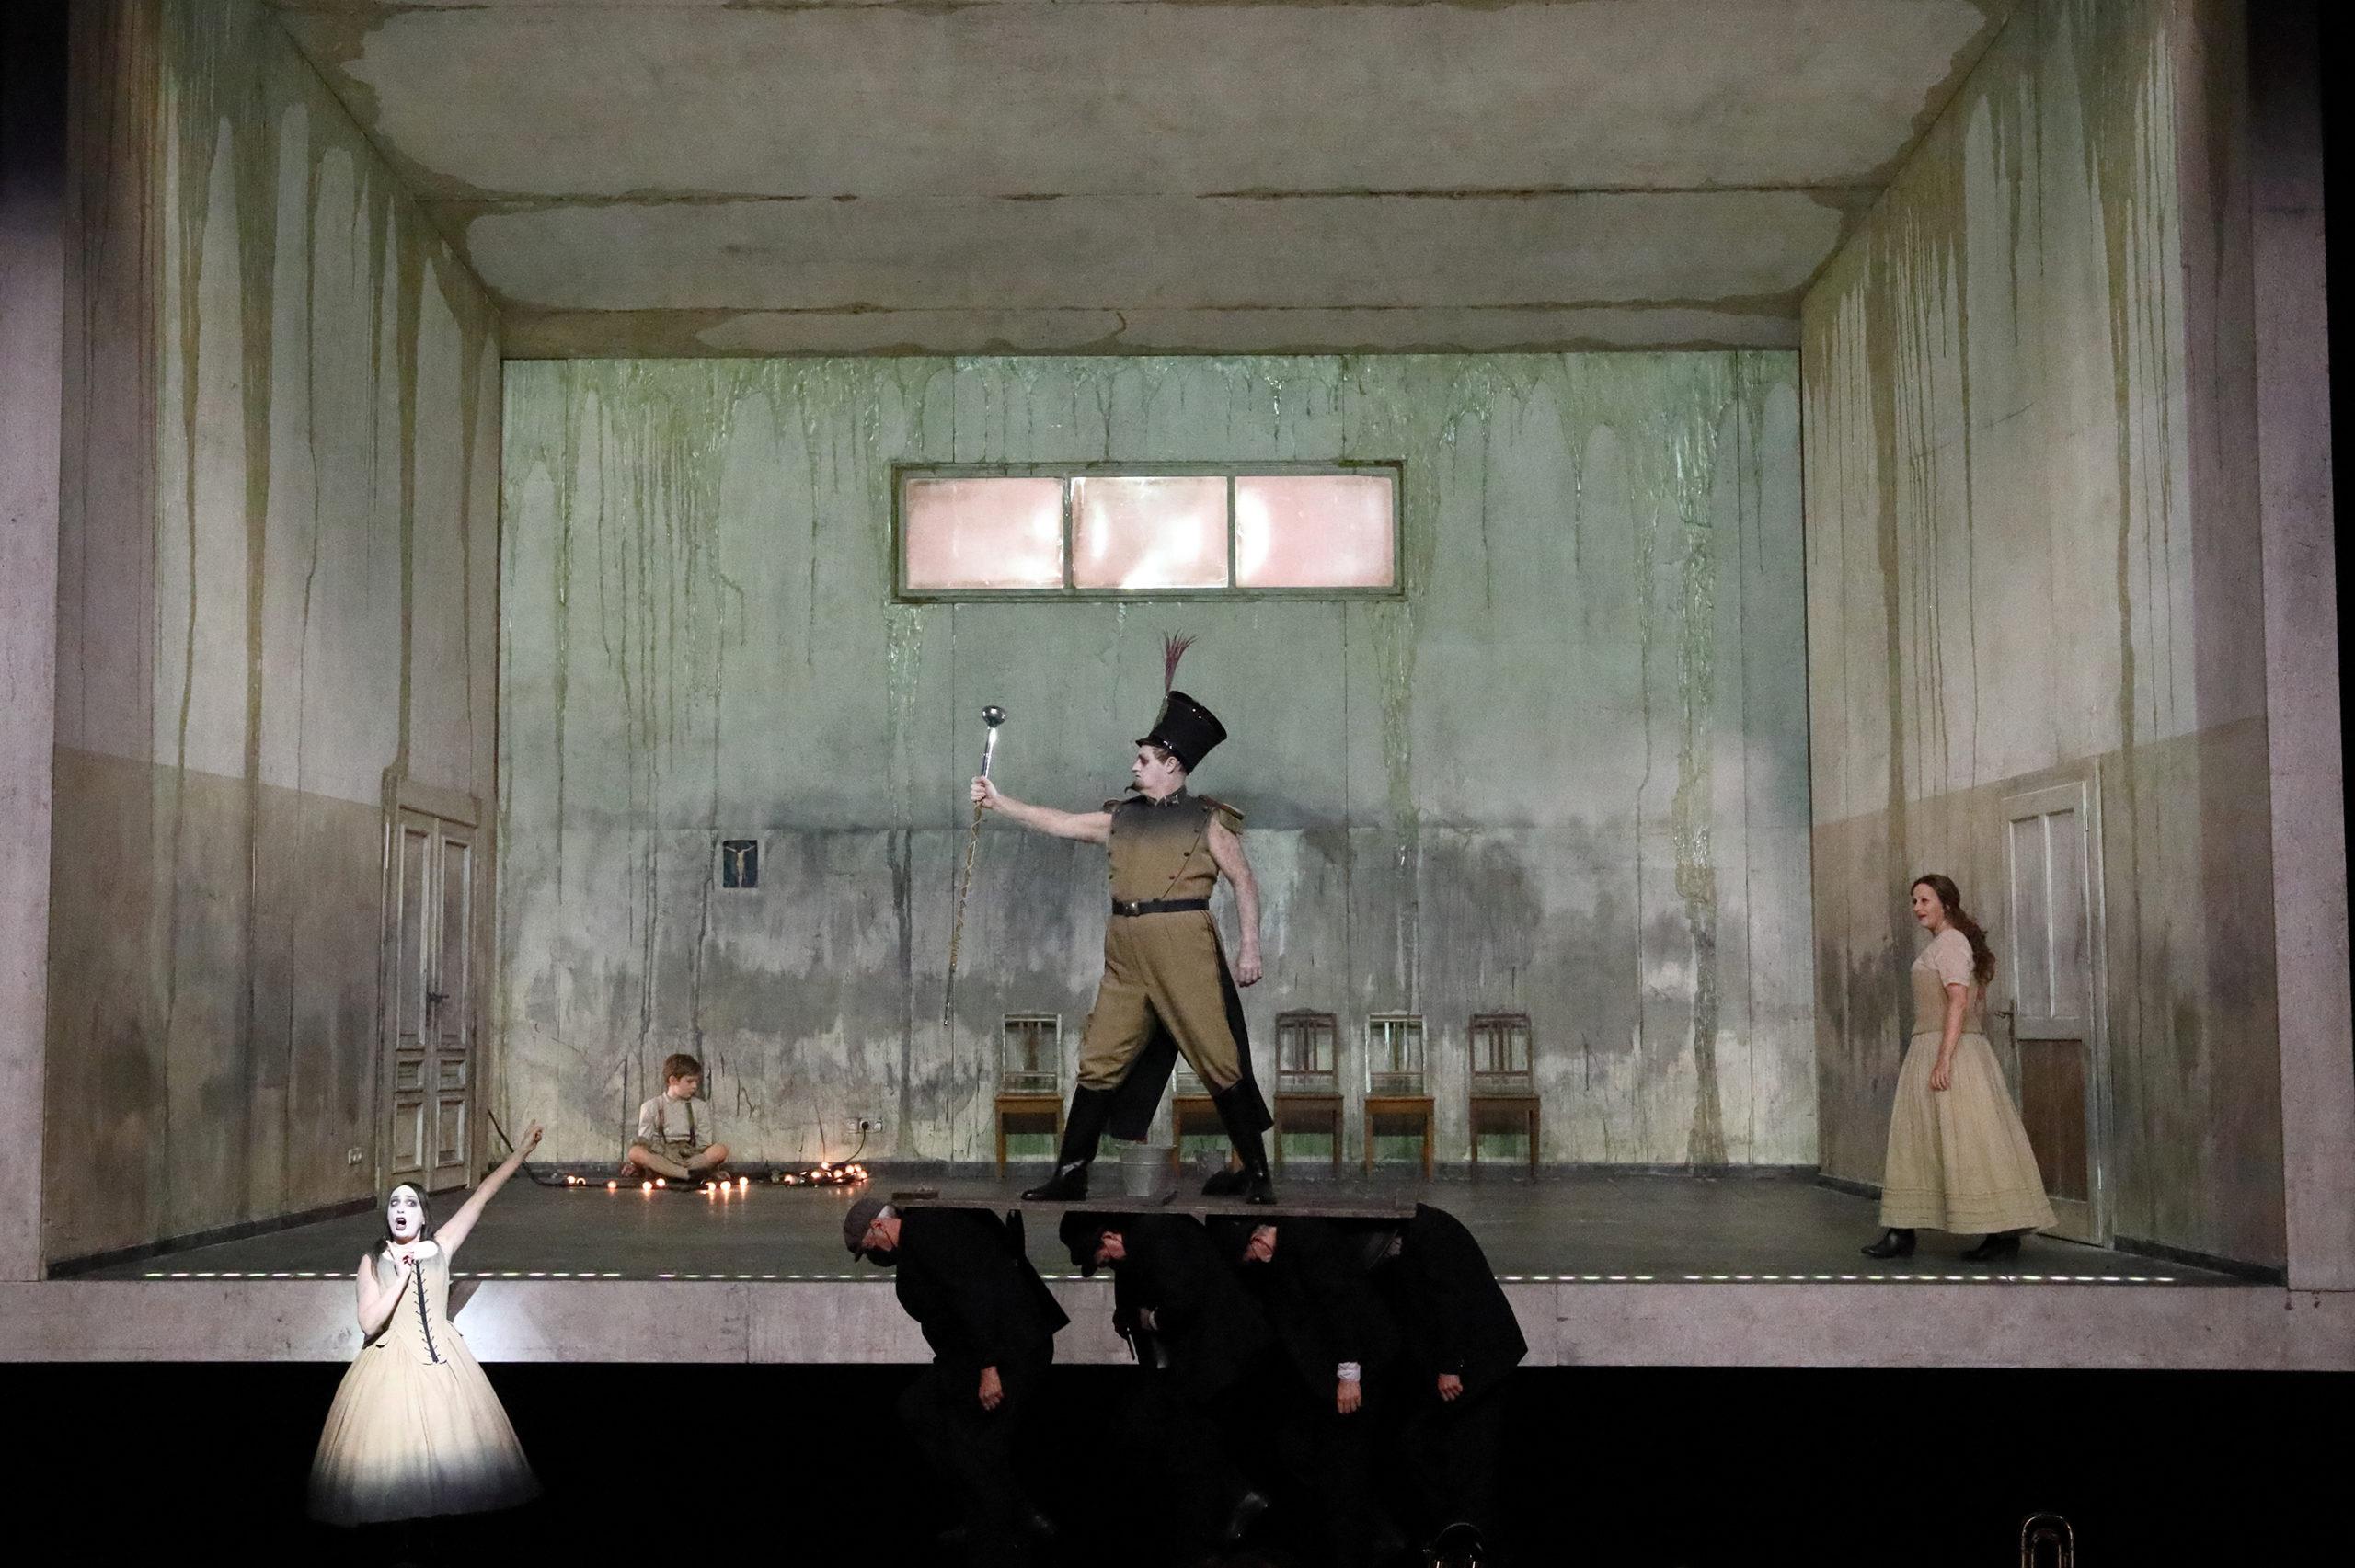 Wozzeck, stage, opera, production, classical, presentation, Kriegenburg, Bayerische Staatsoper, Munich, theatre, performance, reduction, Kloke